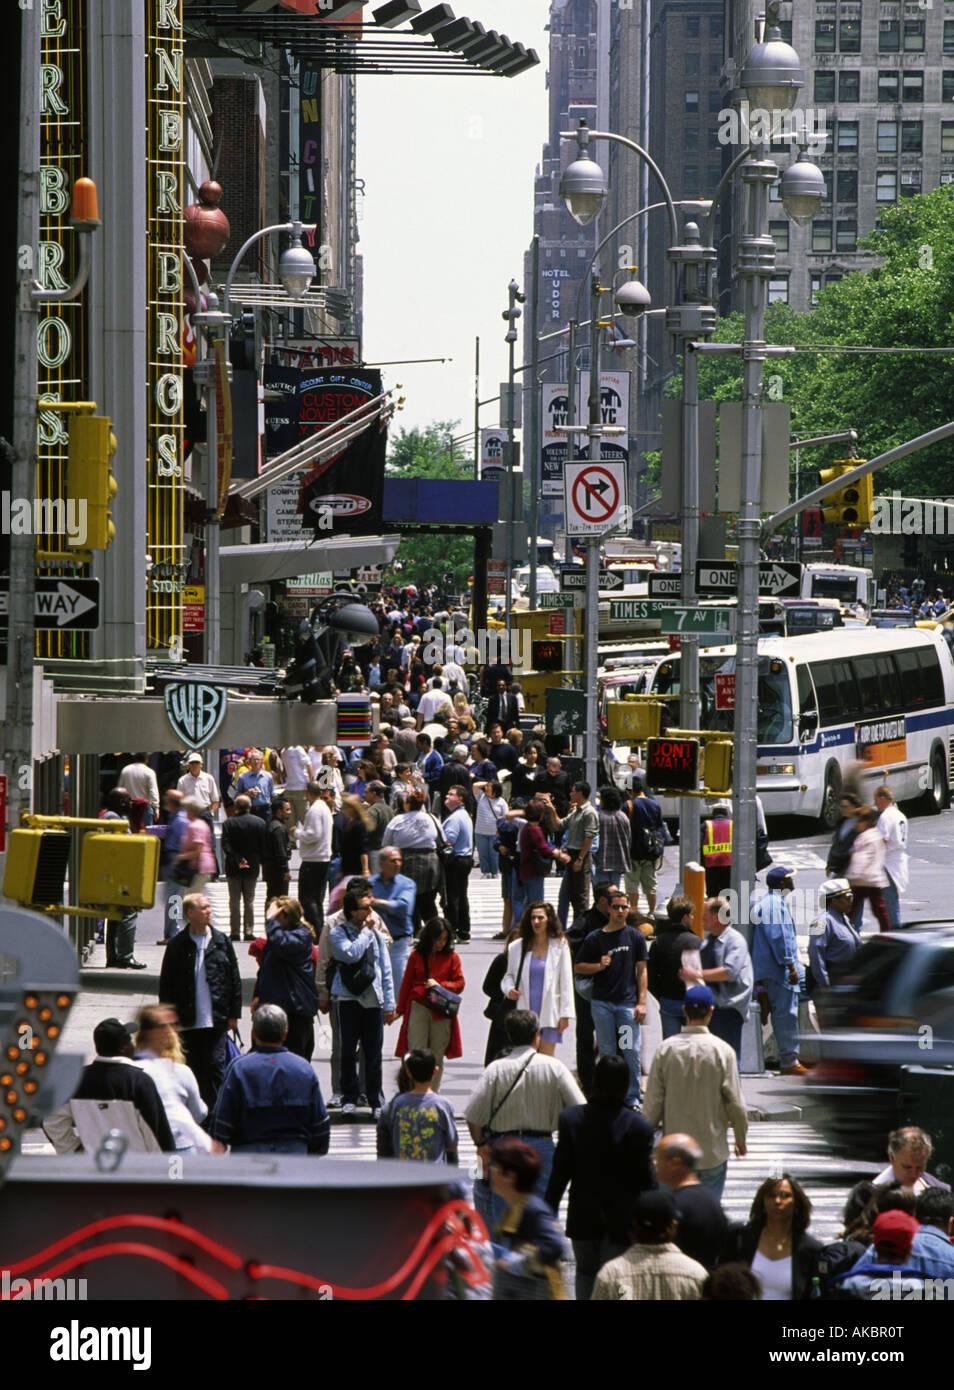 42nd Street New York - Stock Image